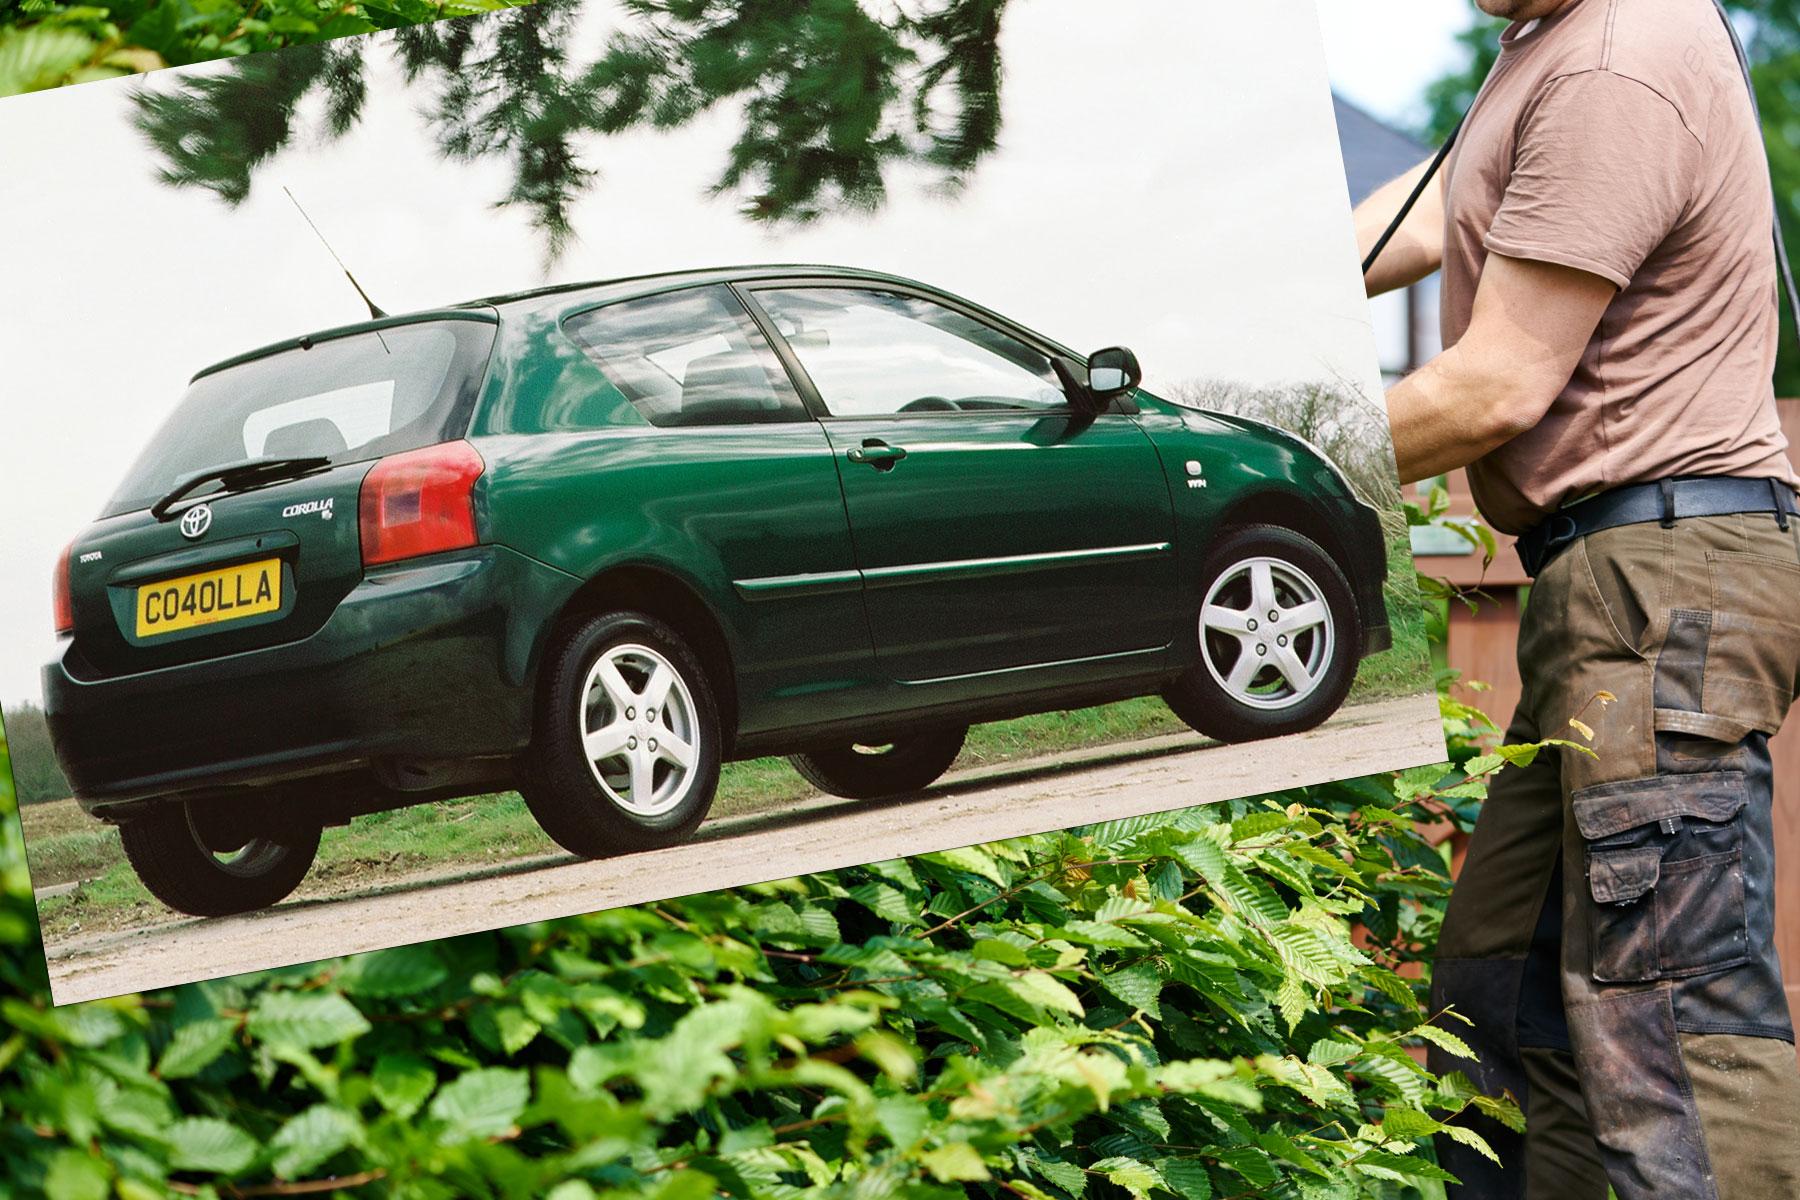 Toyota Corolla garden